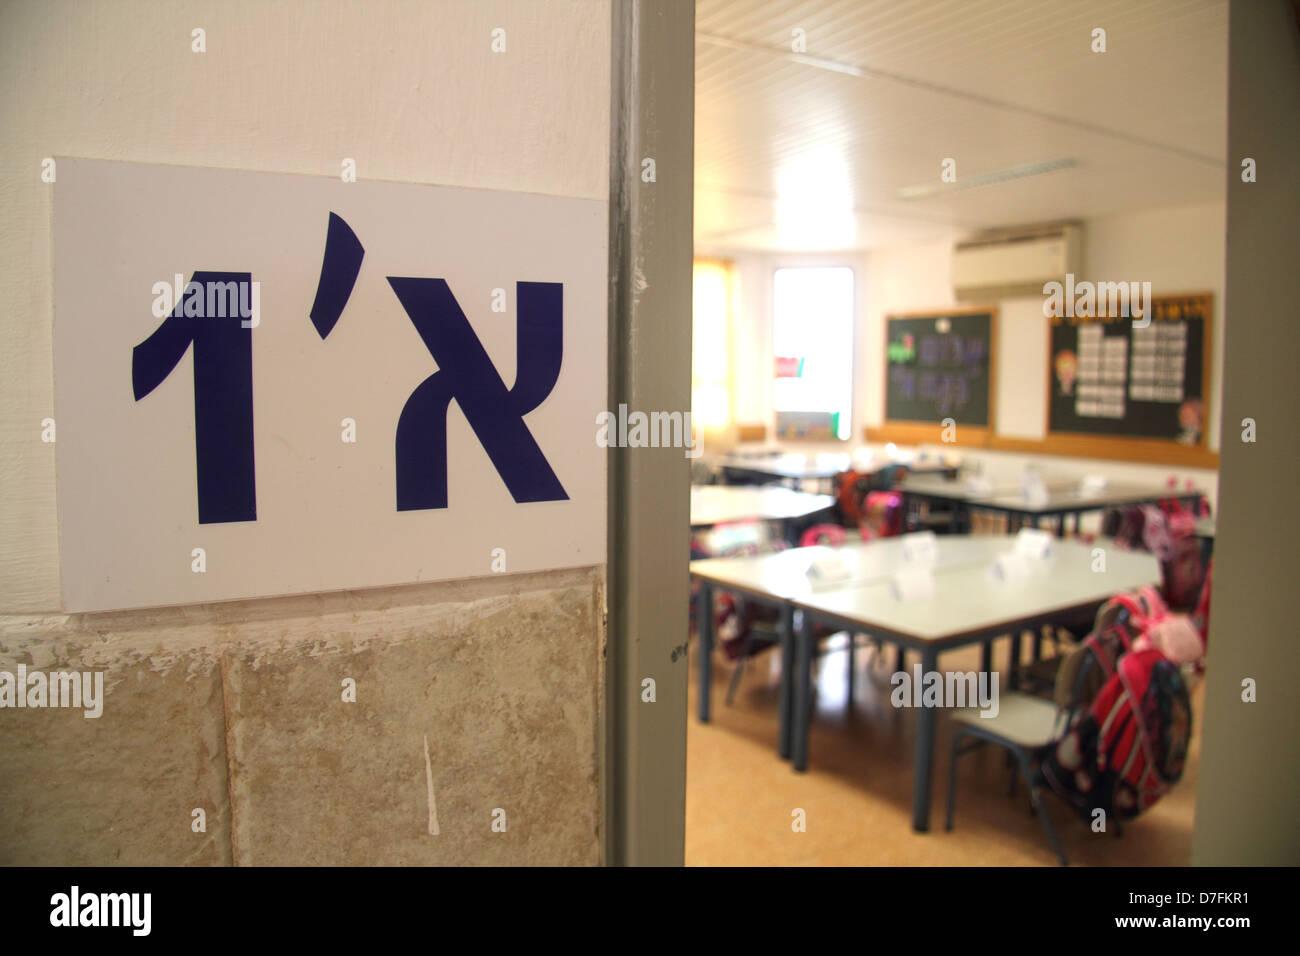 First Grade classroom at Har-Gilon elementary school in Misgav, Galilee - Stock Image